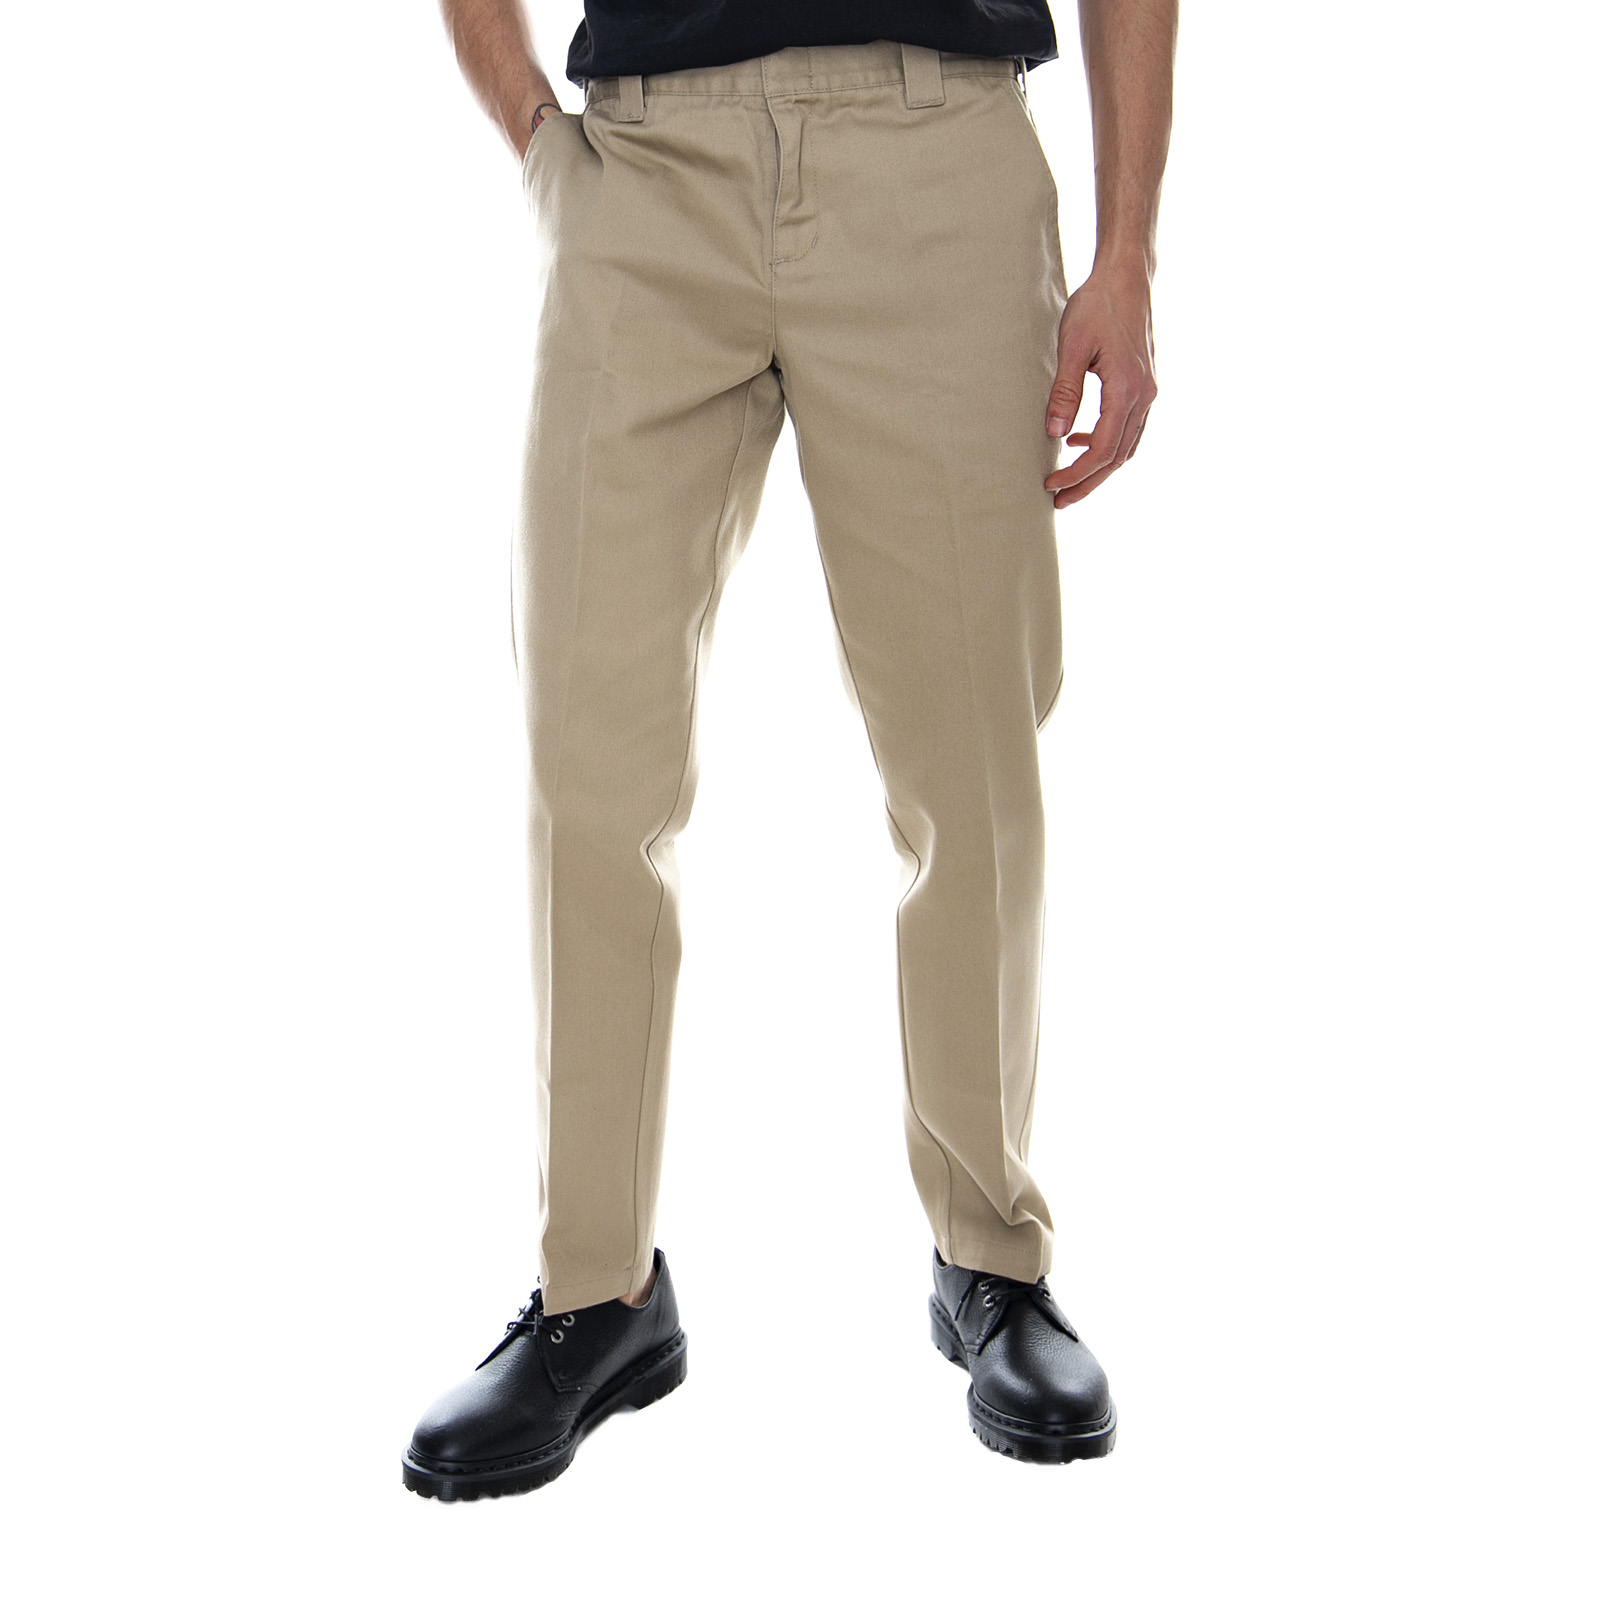 Abbigliamento specifico Abbigliamento Dickies Slim Fit Work Pant Pantaloni Uomo